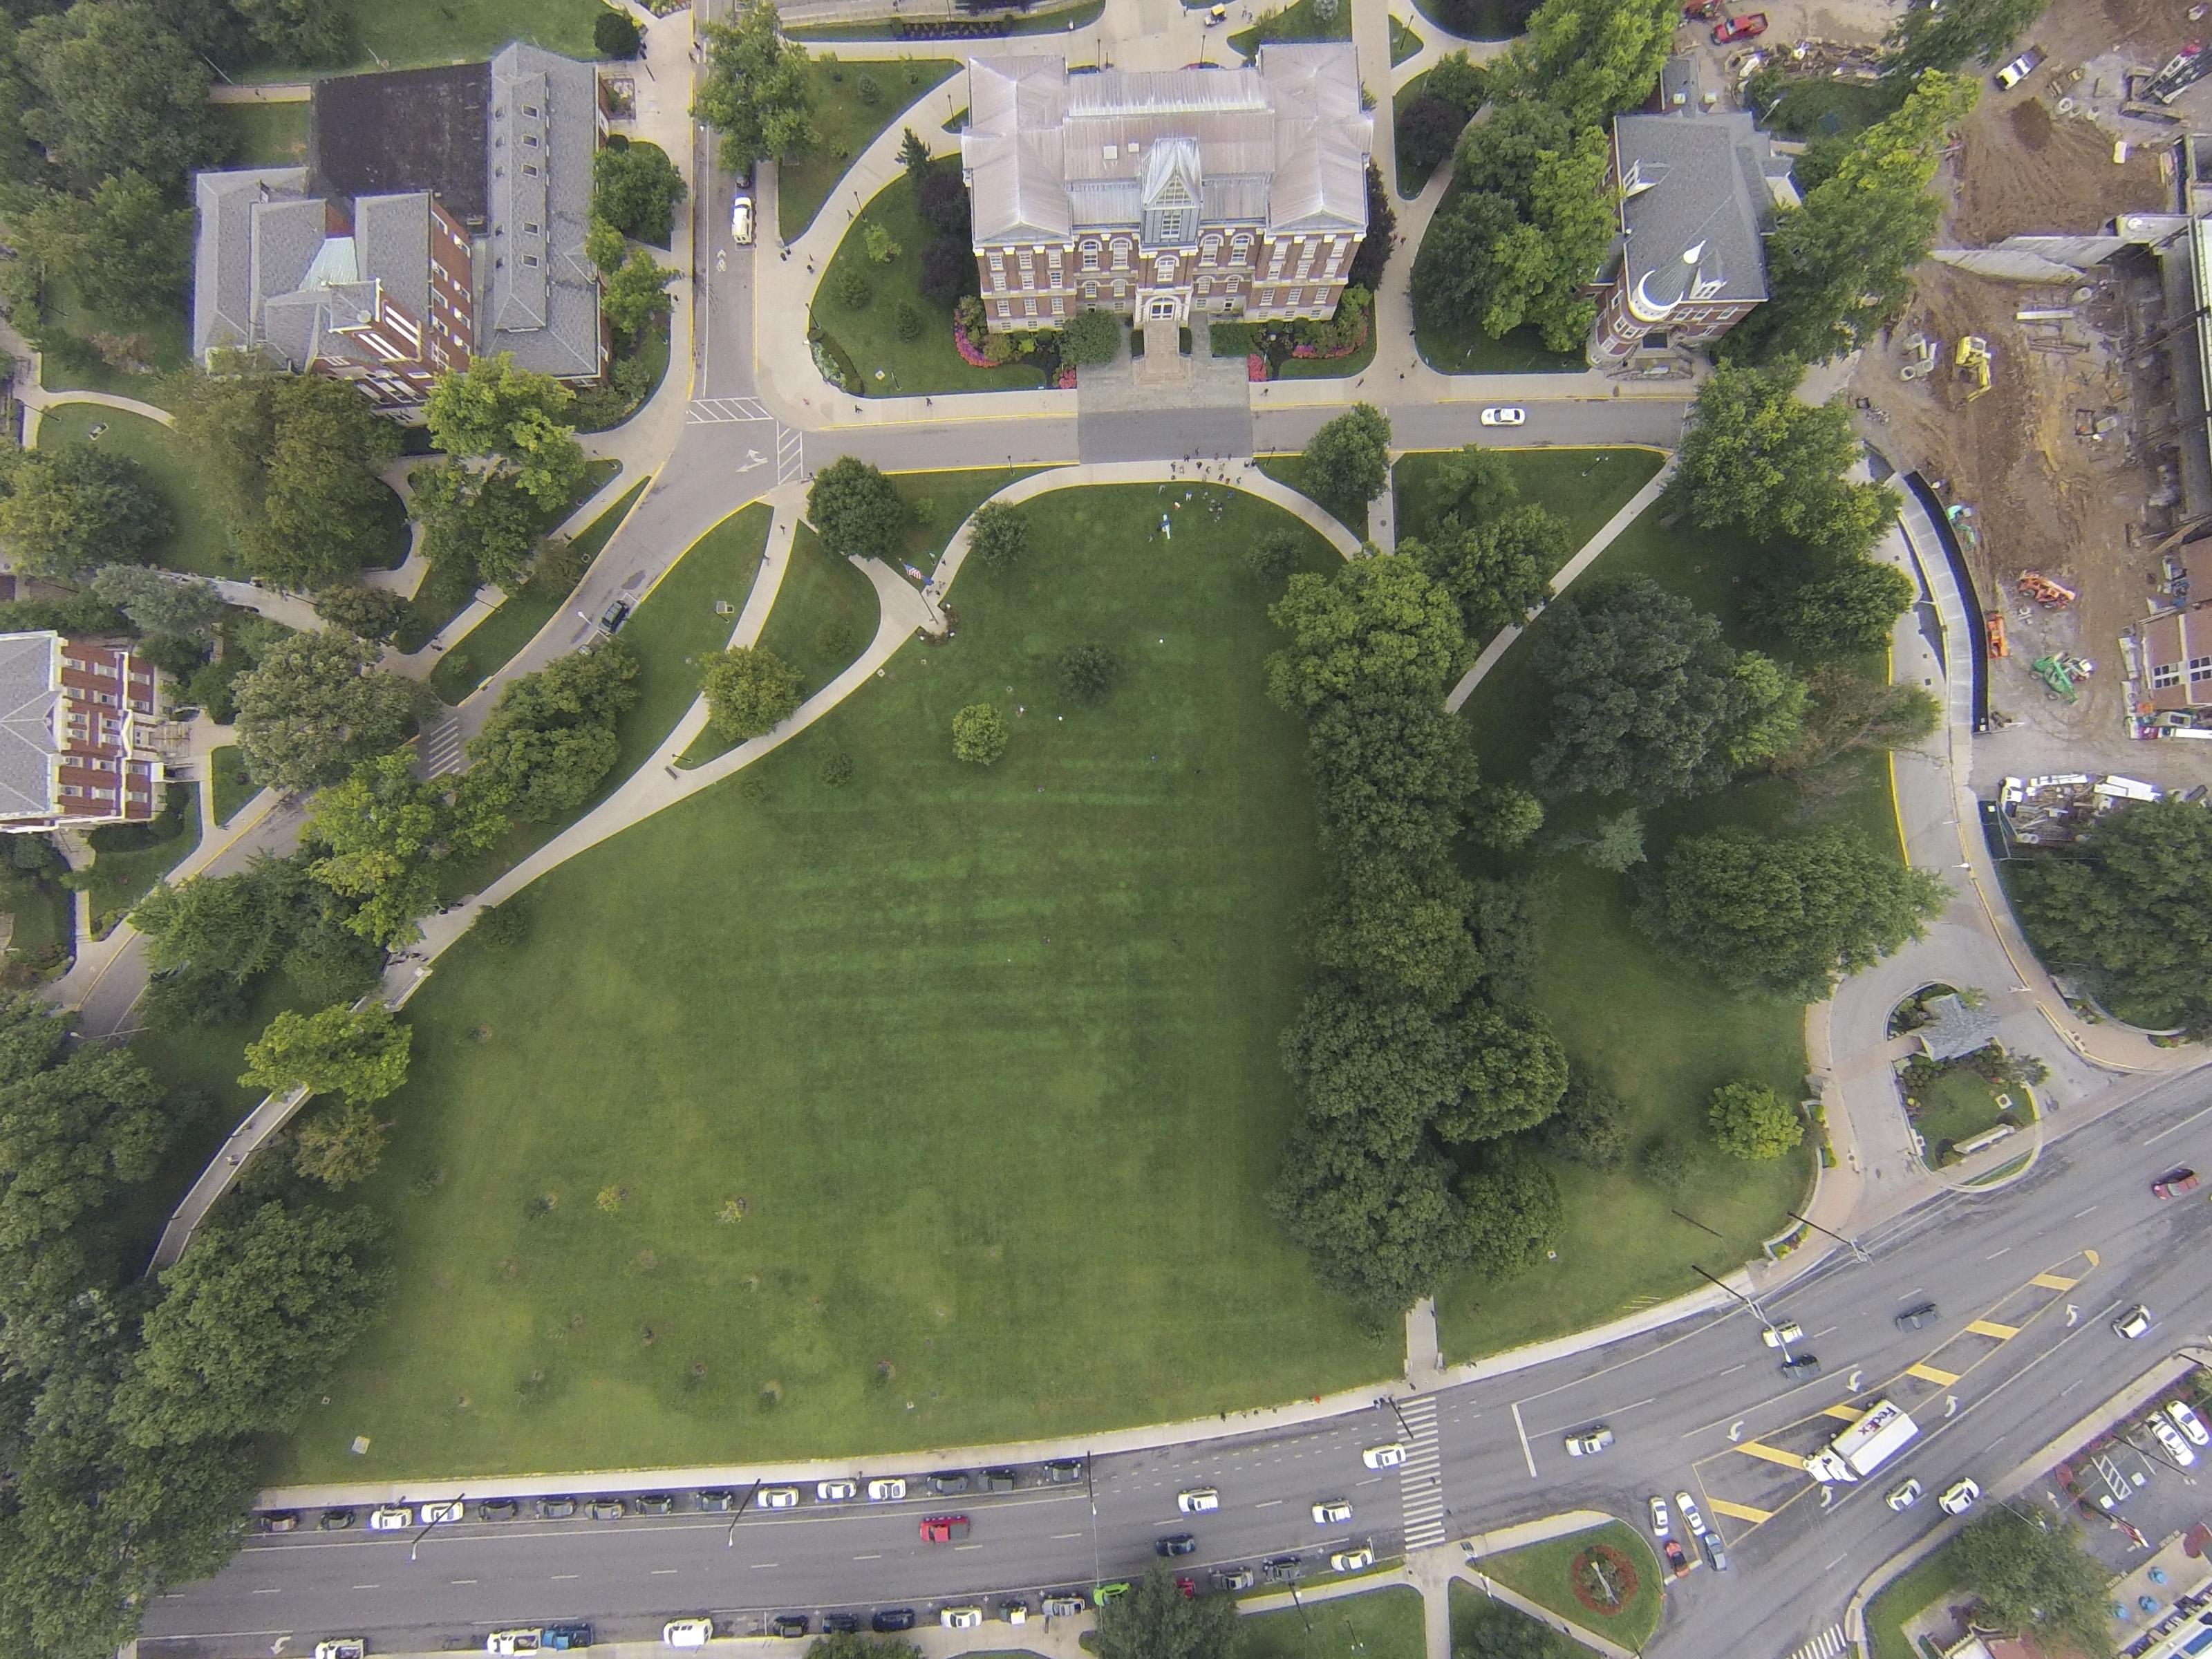 University green map